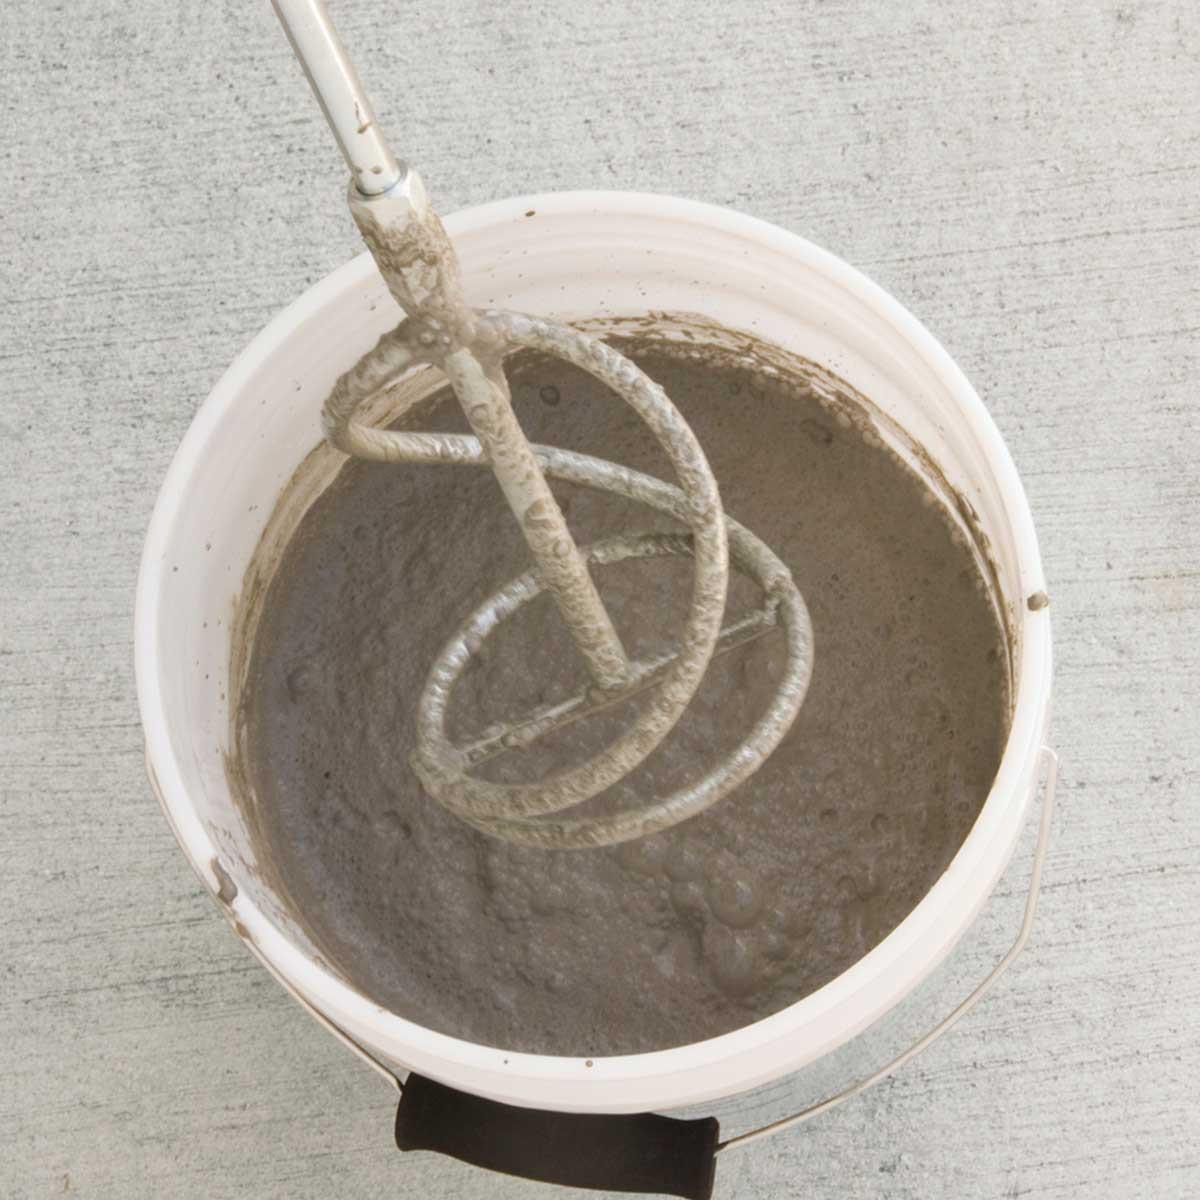 QEP 21665 mixing drill mortar